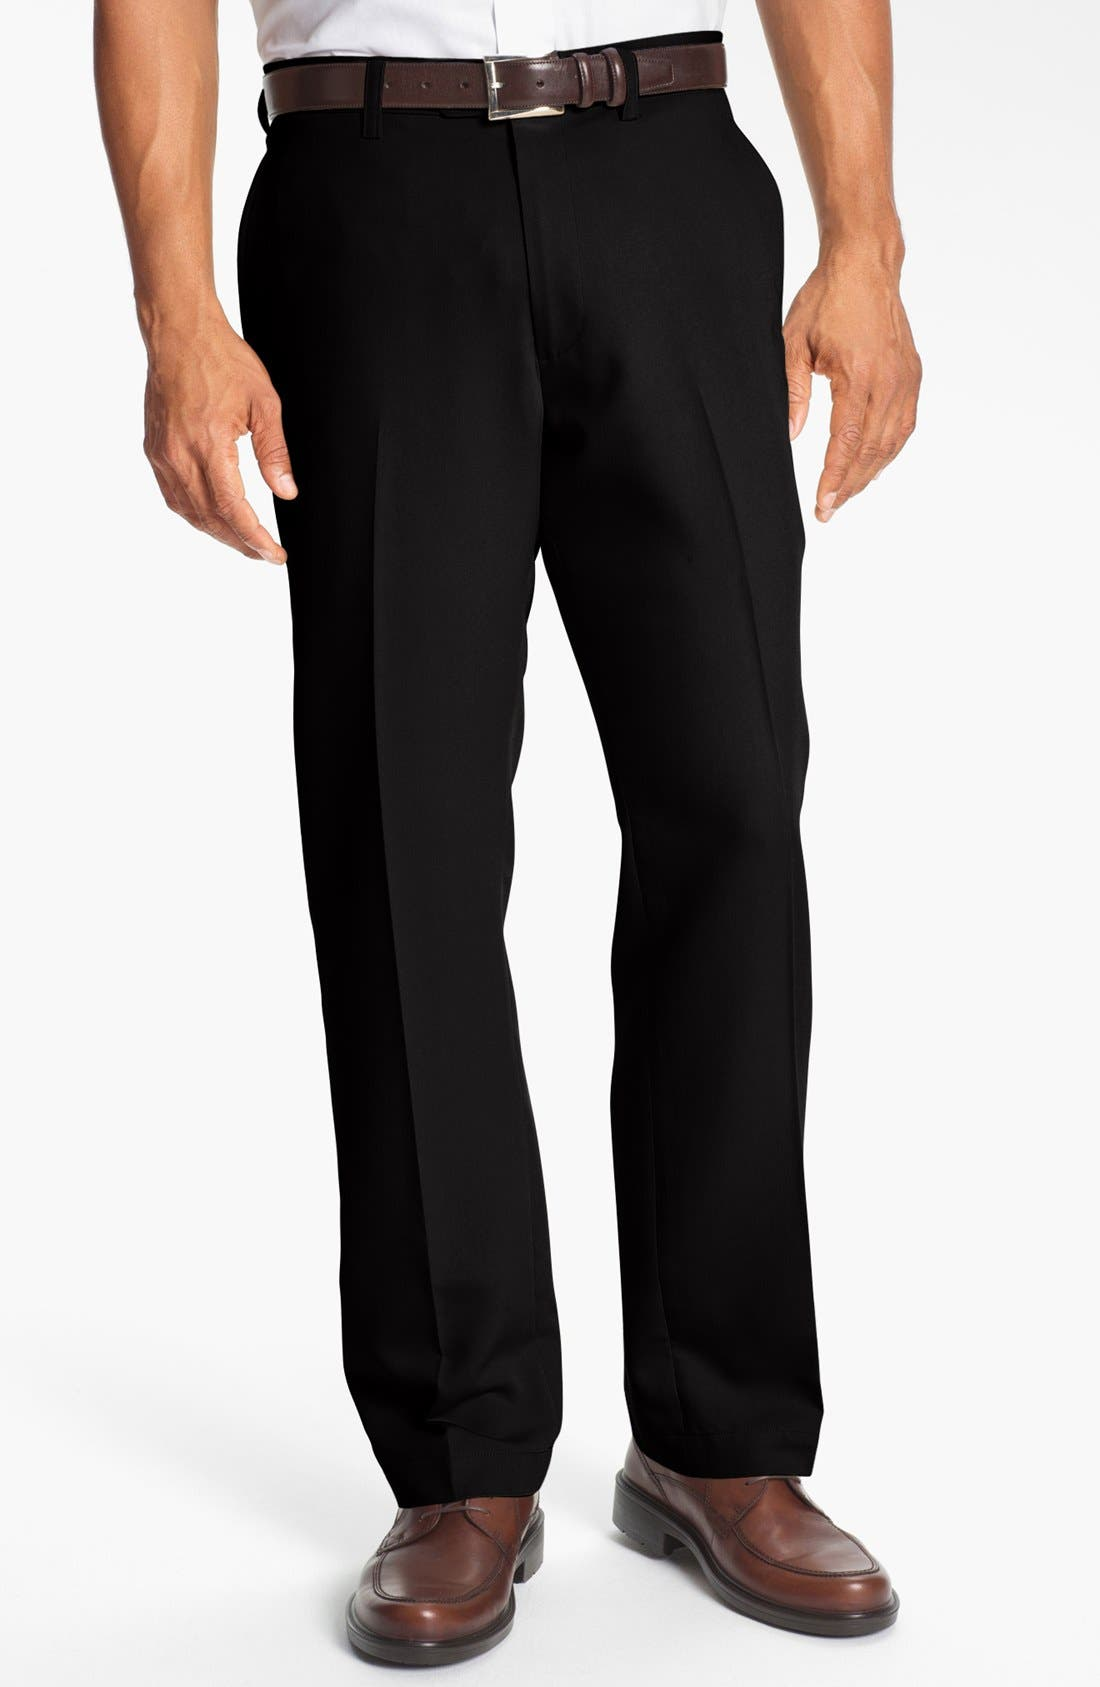 Microfiber Twill Pants,                             Main thumbnail 1, color,                             BLACK